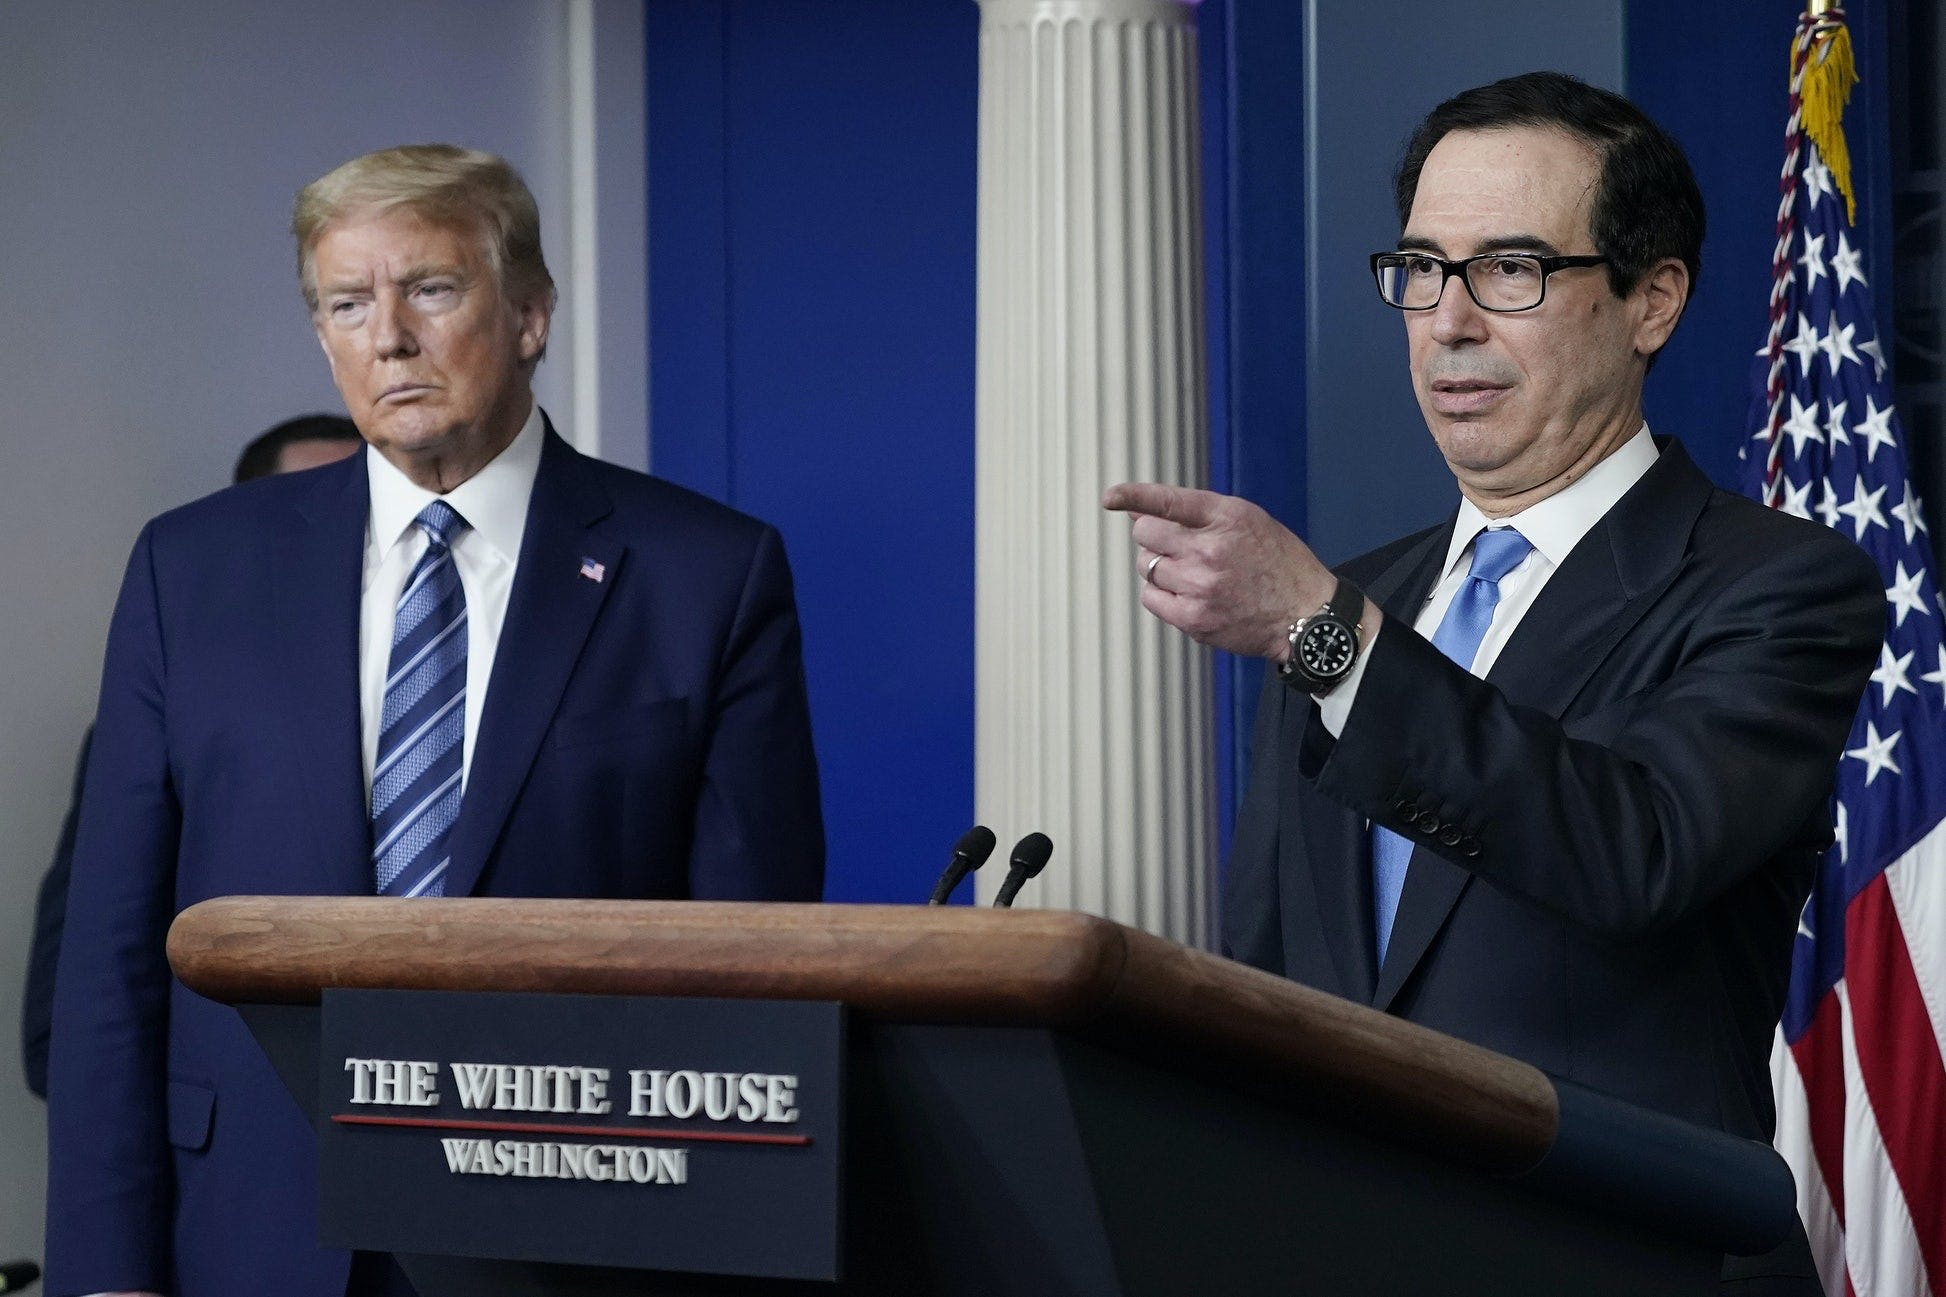 Treasury Secretary Steven Mnuchin takes questions as President Trump looks on